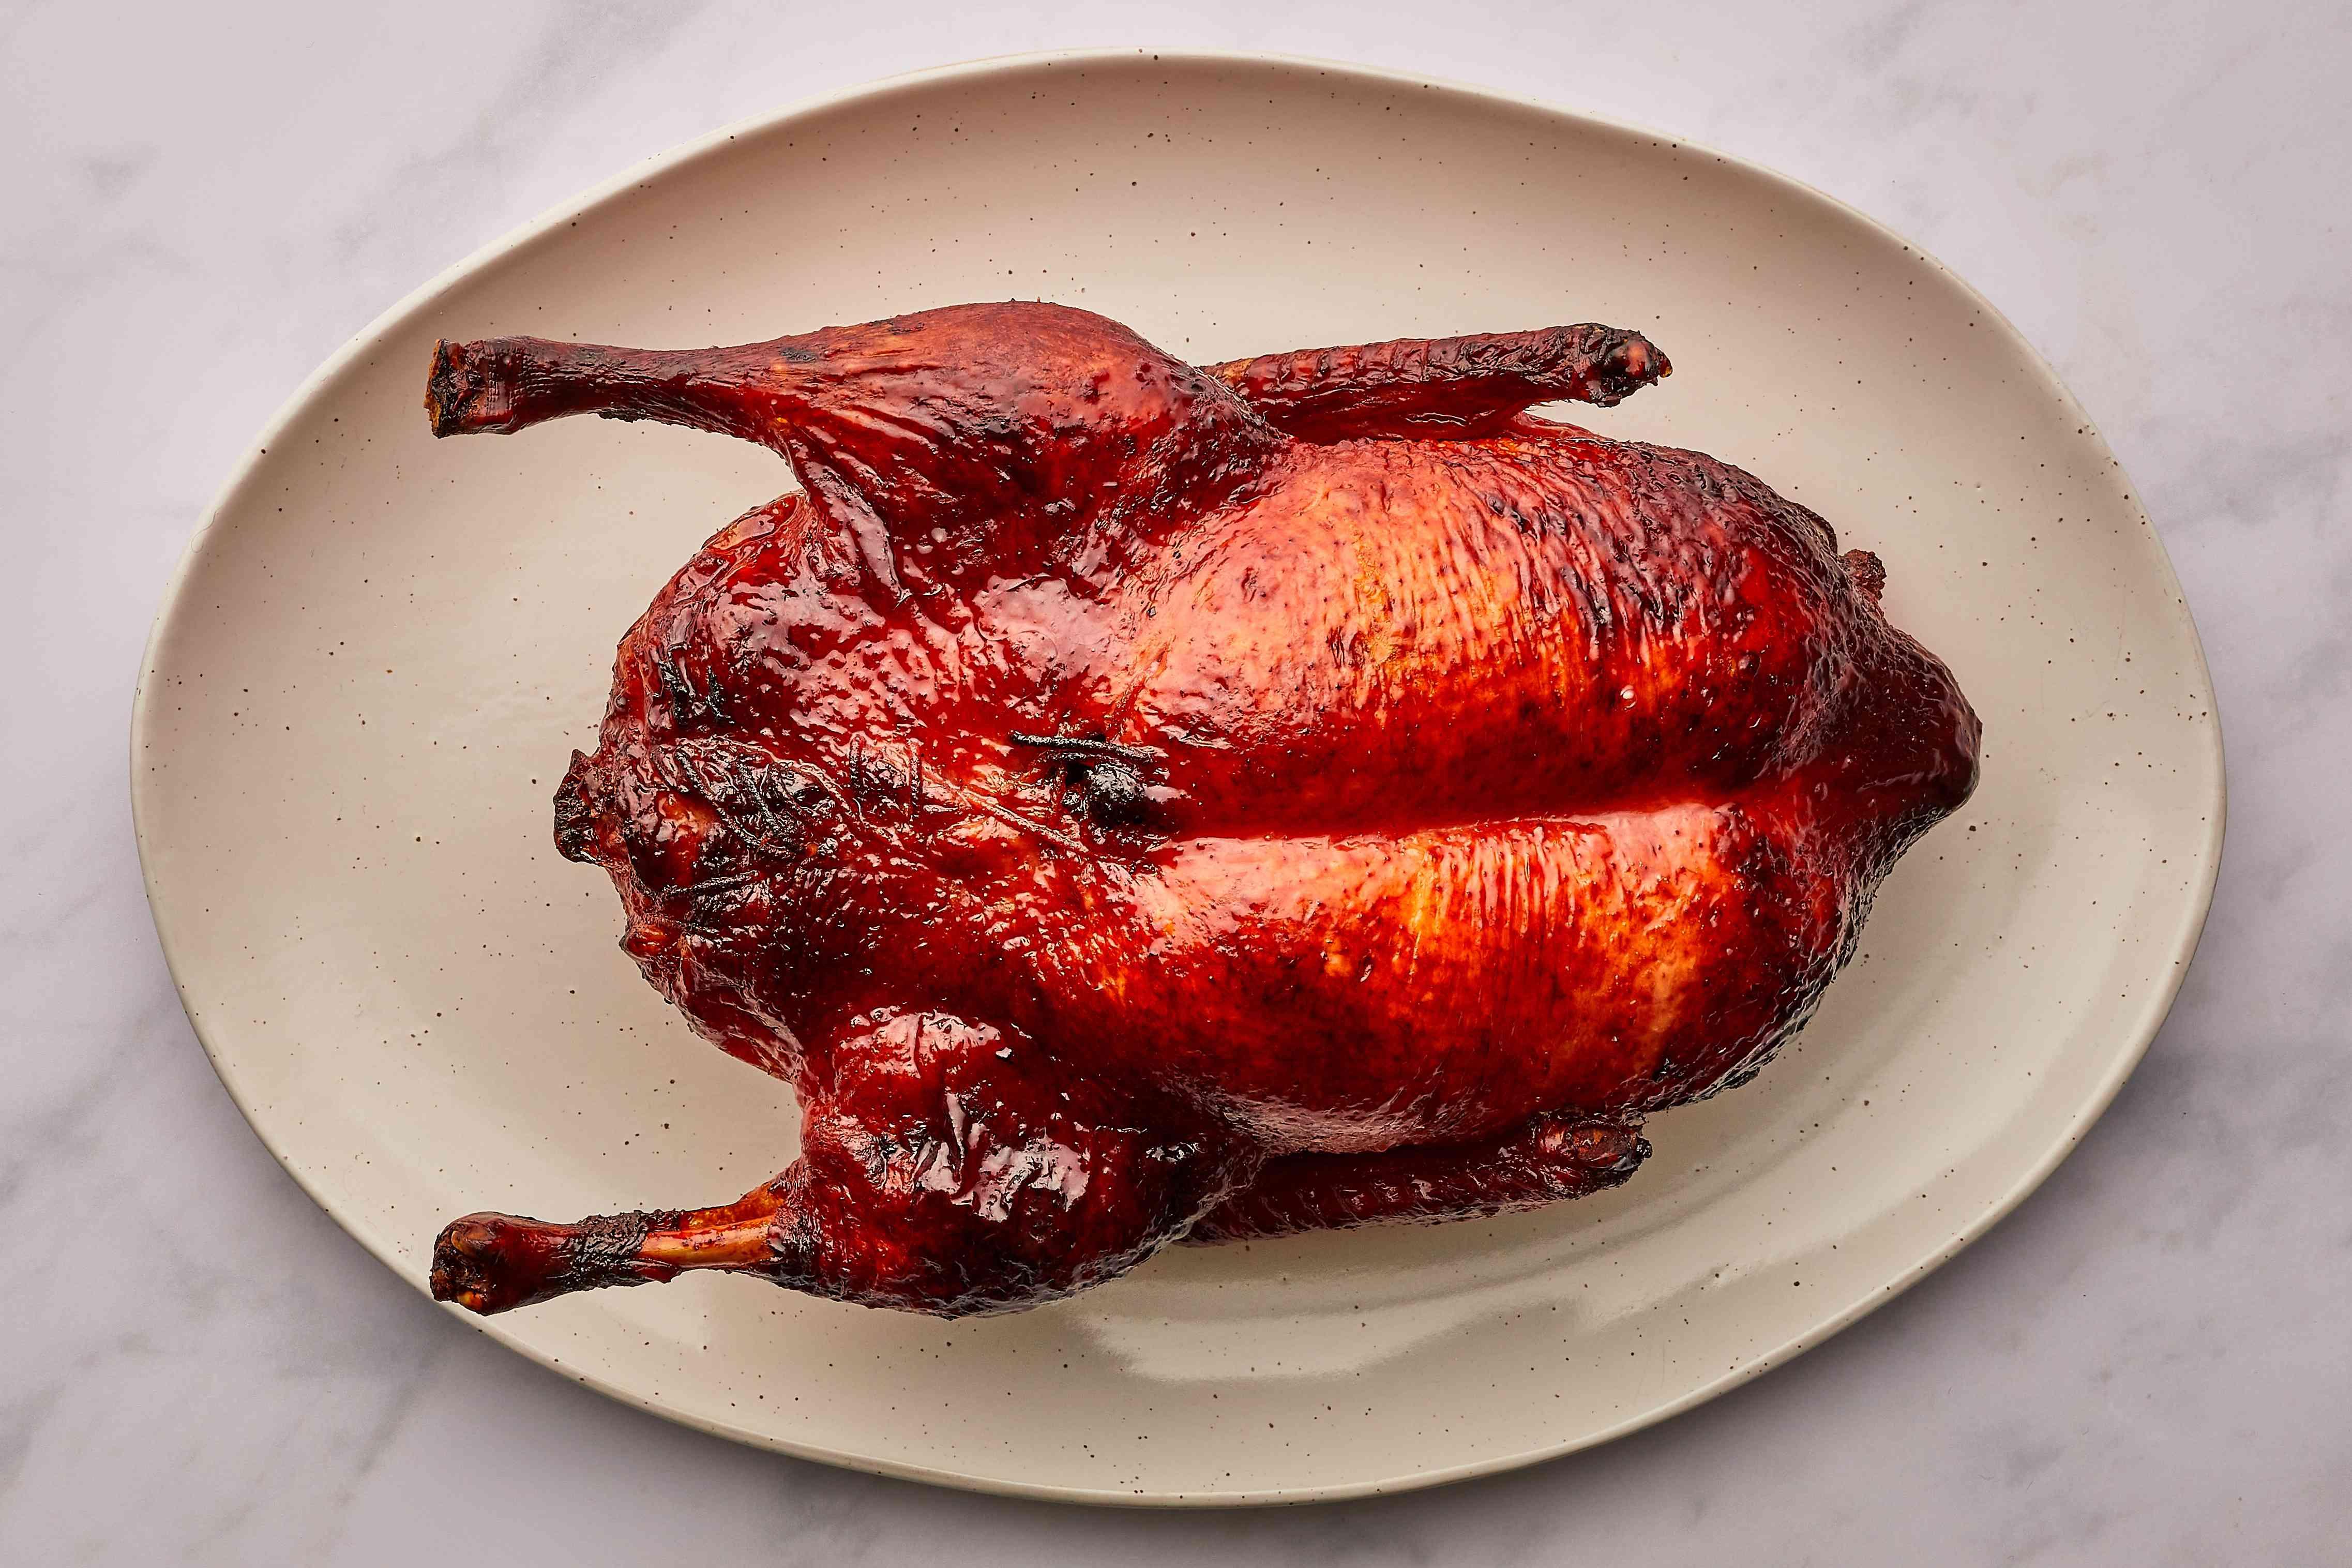 Cantonese Roast Duck on a plate